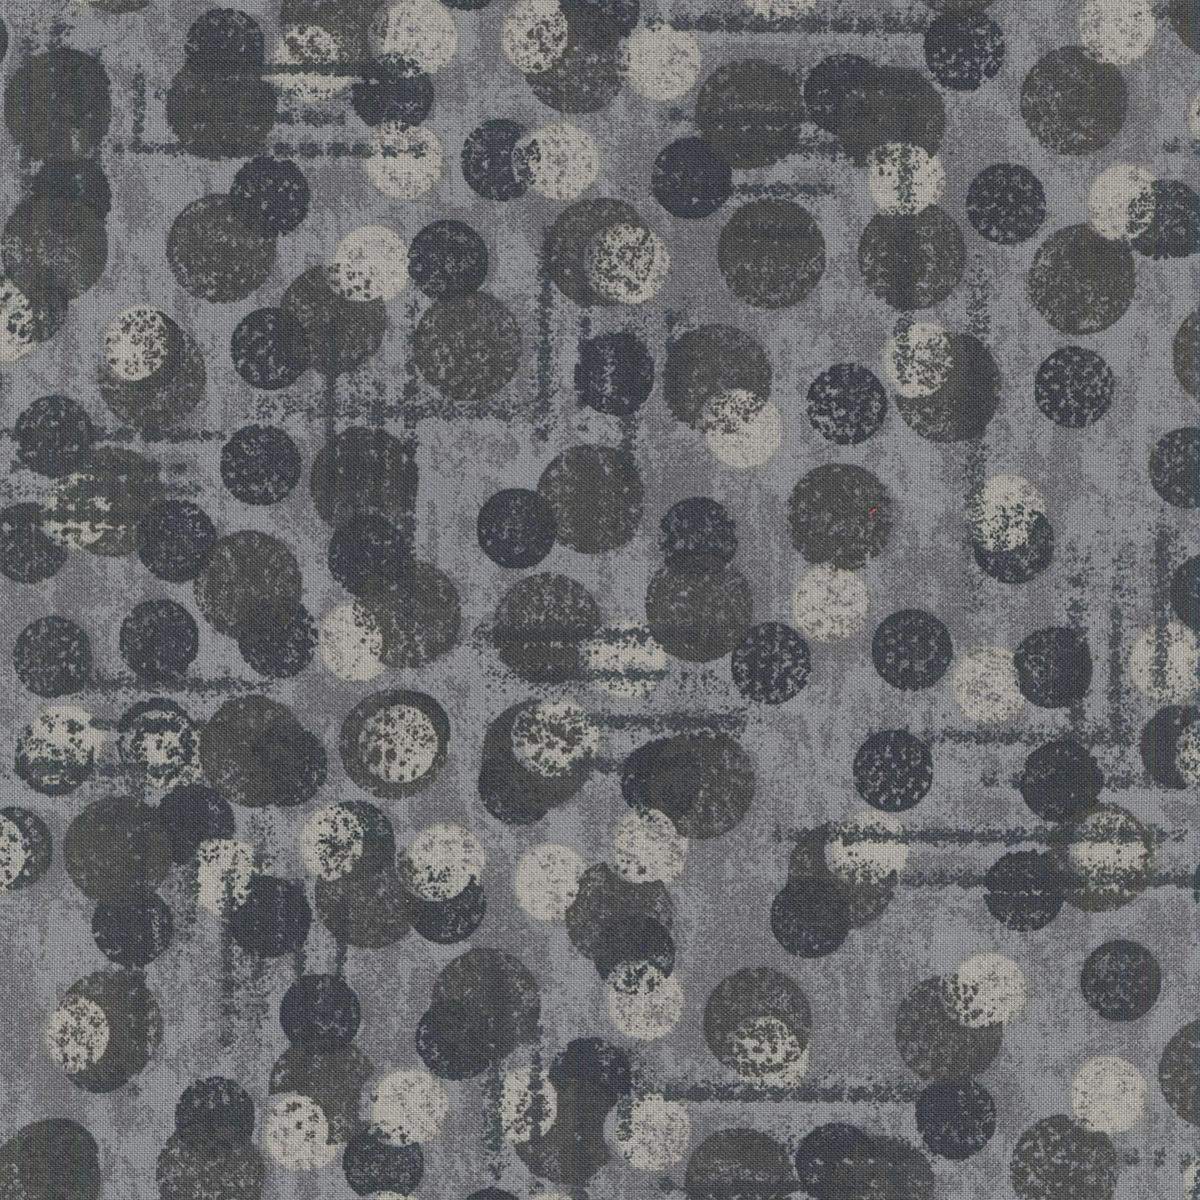 108 Jot Dot 1230 92 in Charcoal